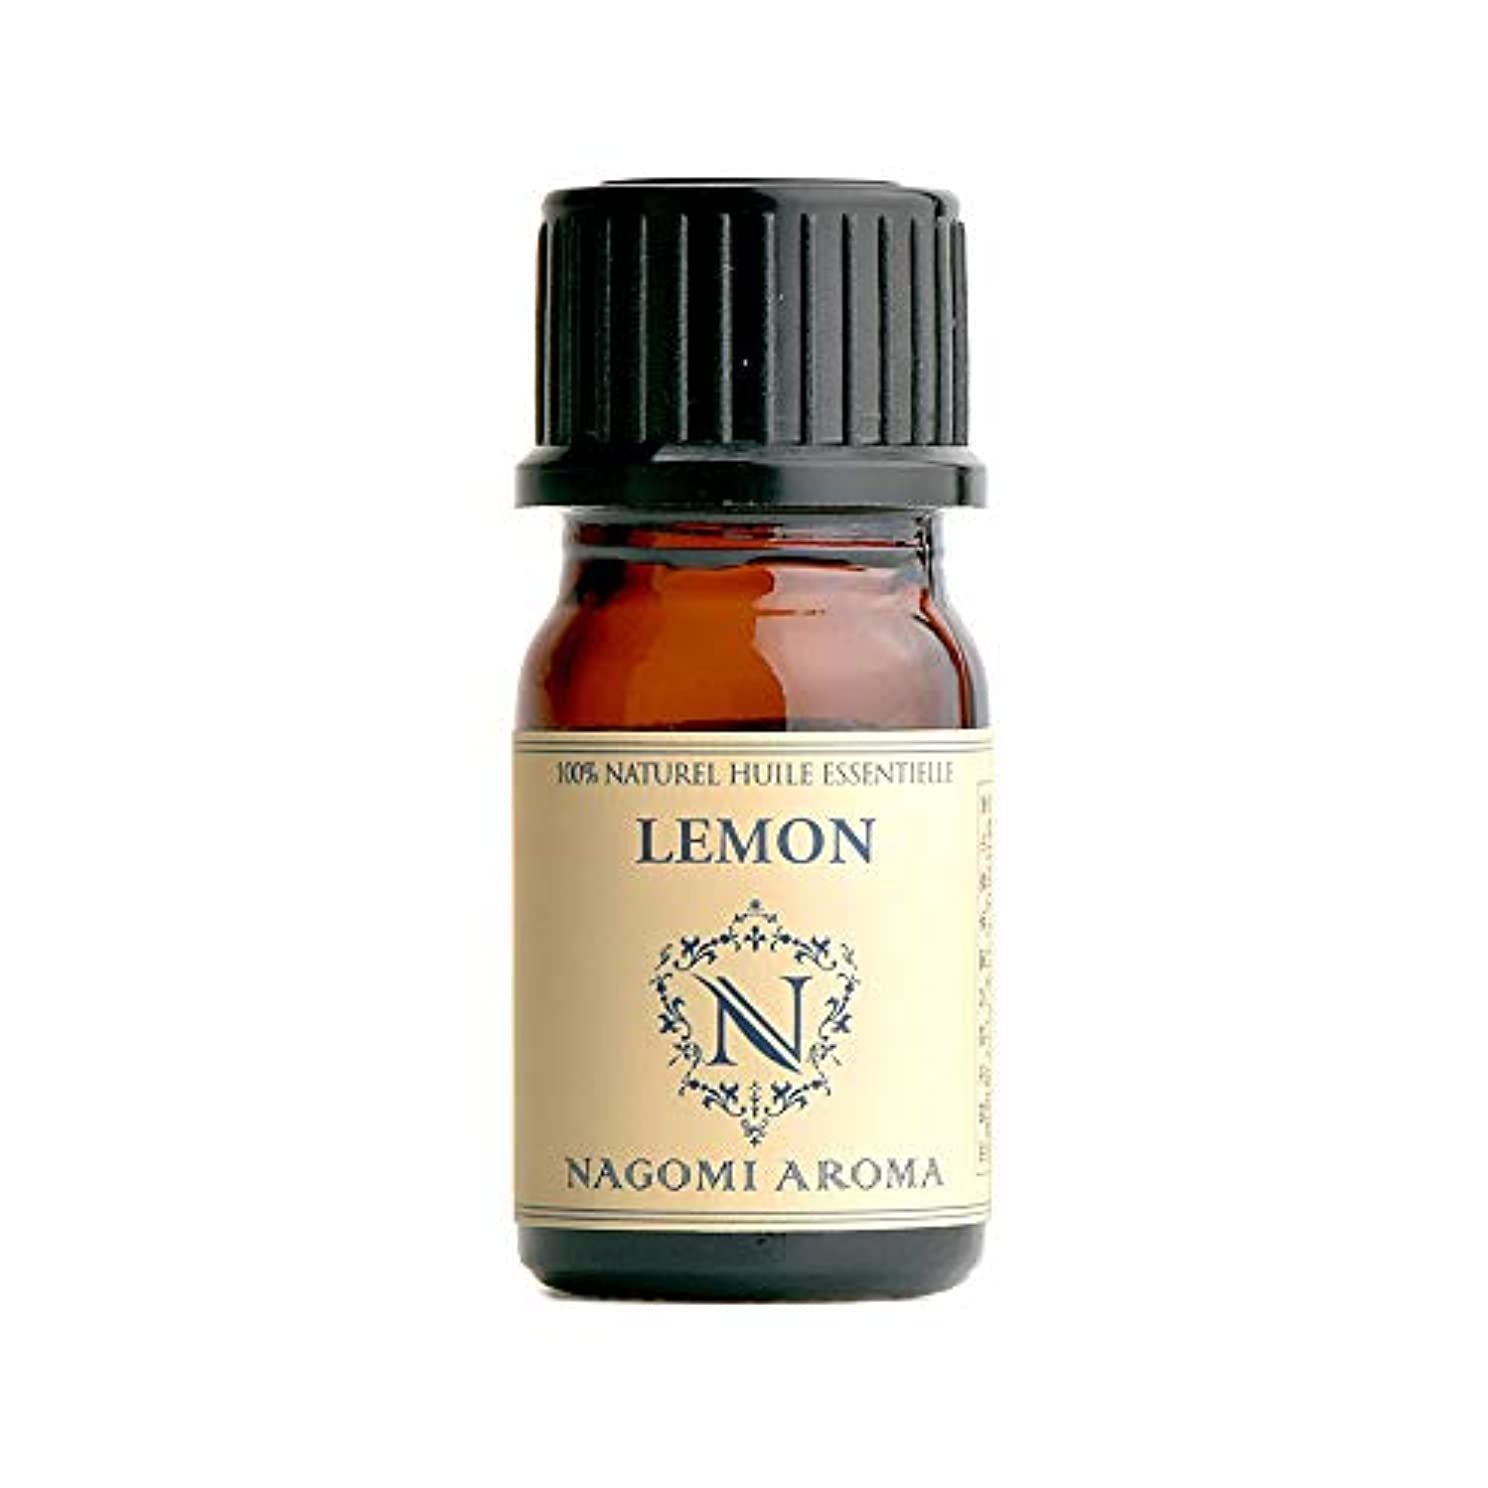 【AEAJ認定表示基準認定精油】NAGOMI PURE レモン 5ml 【エッセンシャルオイル】【精油】【アロマオイル】